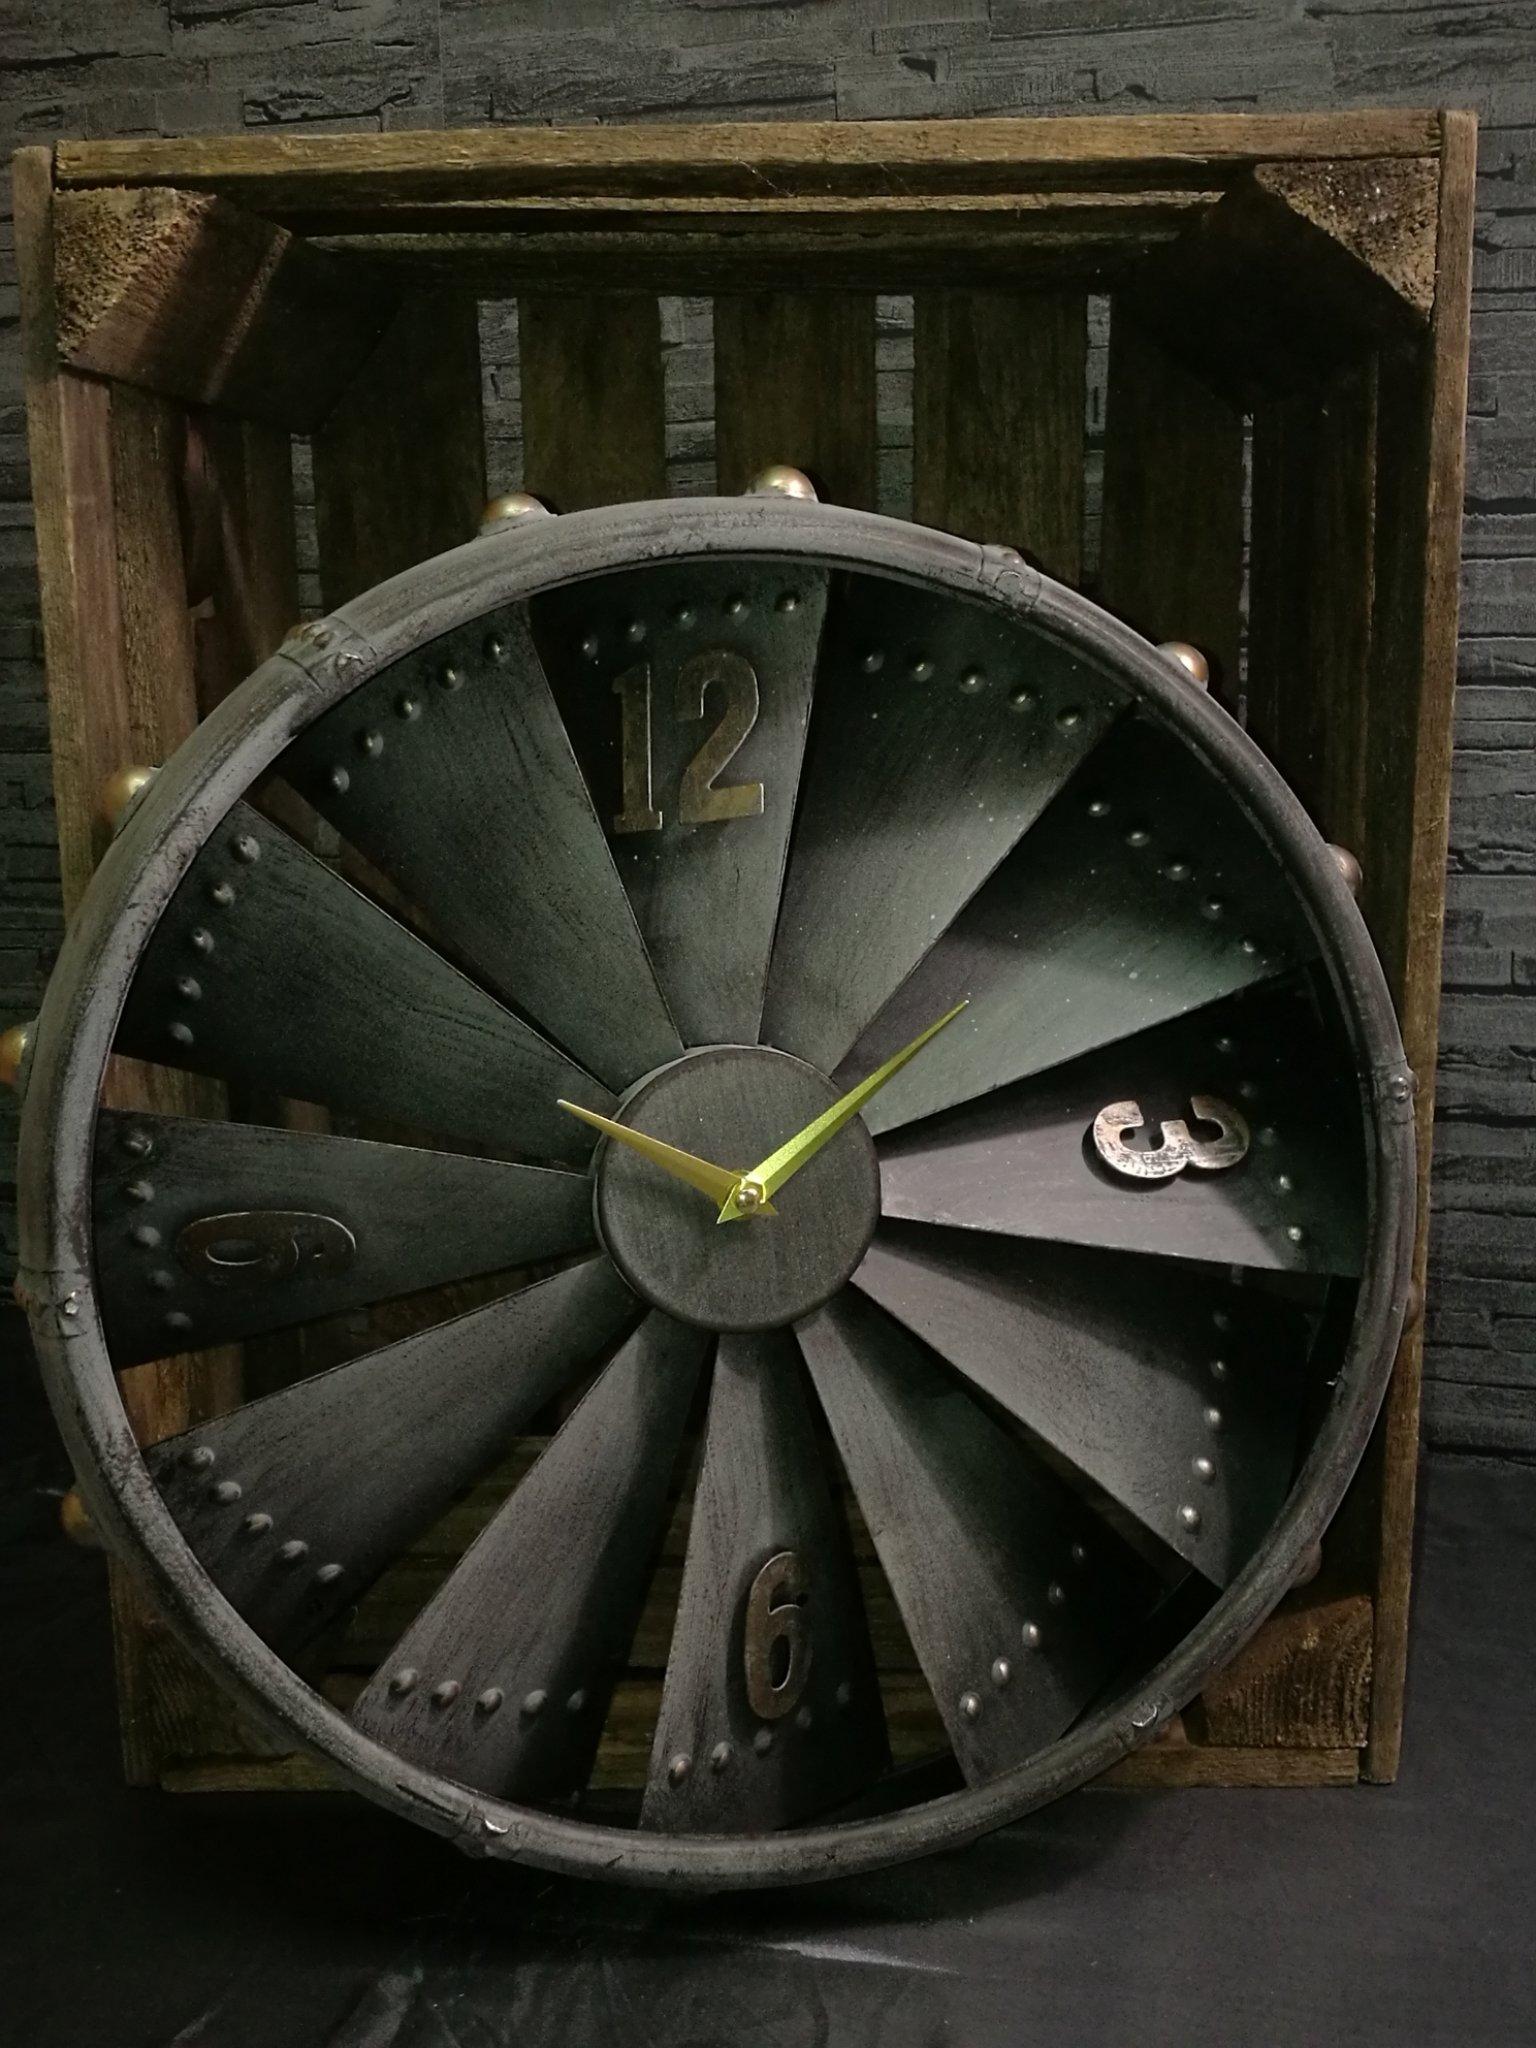 Wandklok vliegtuigmotor 00876